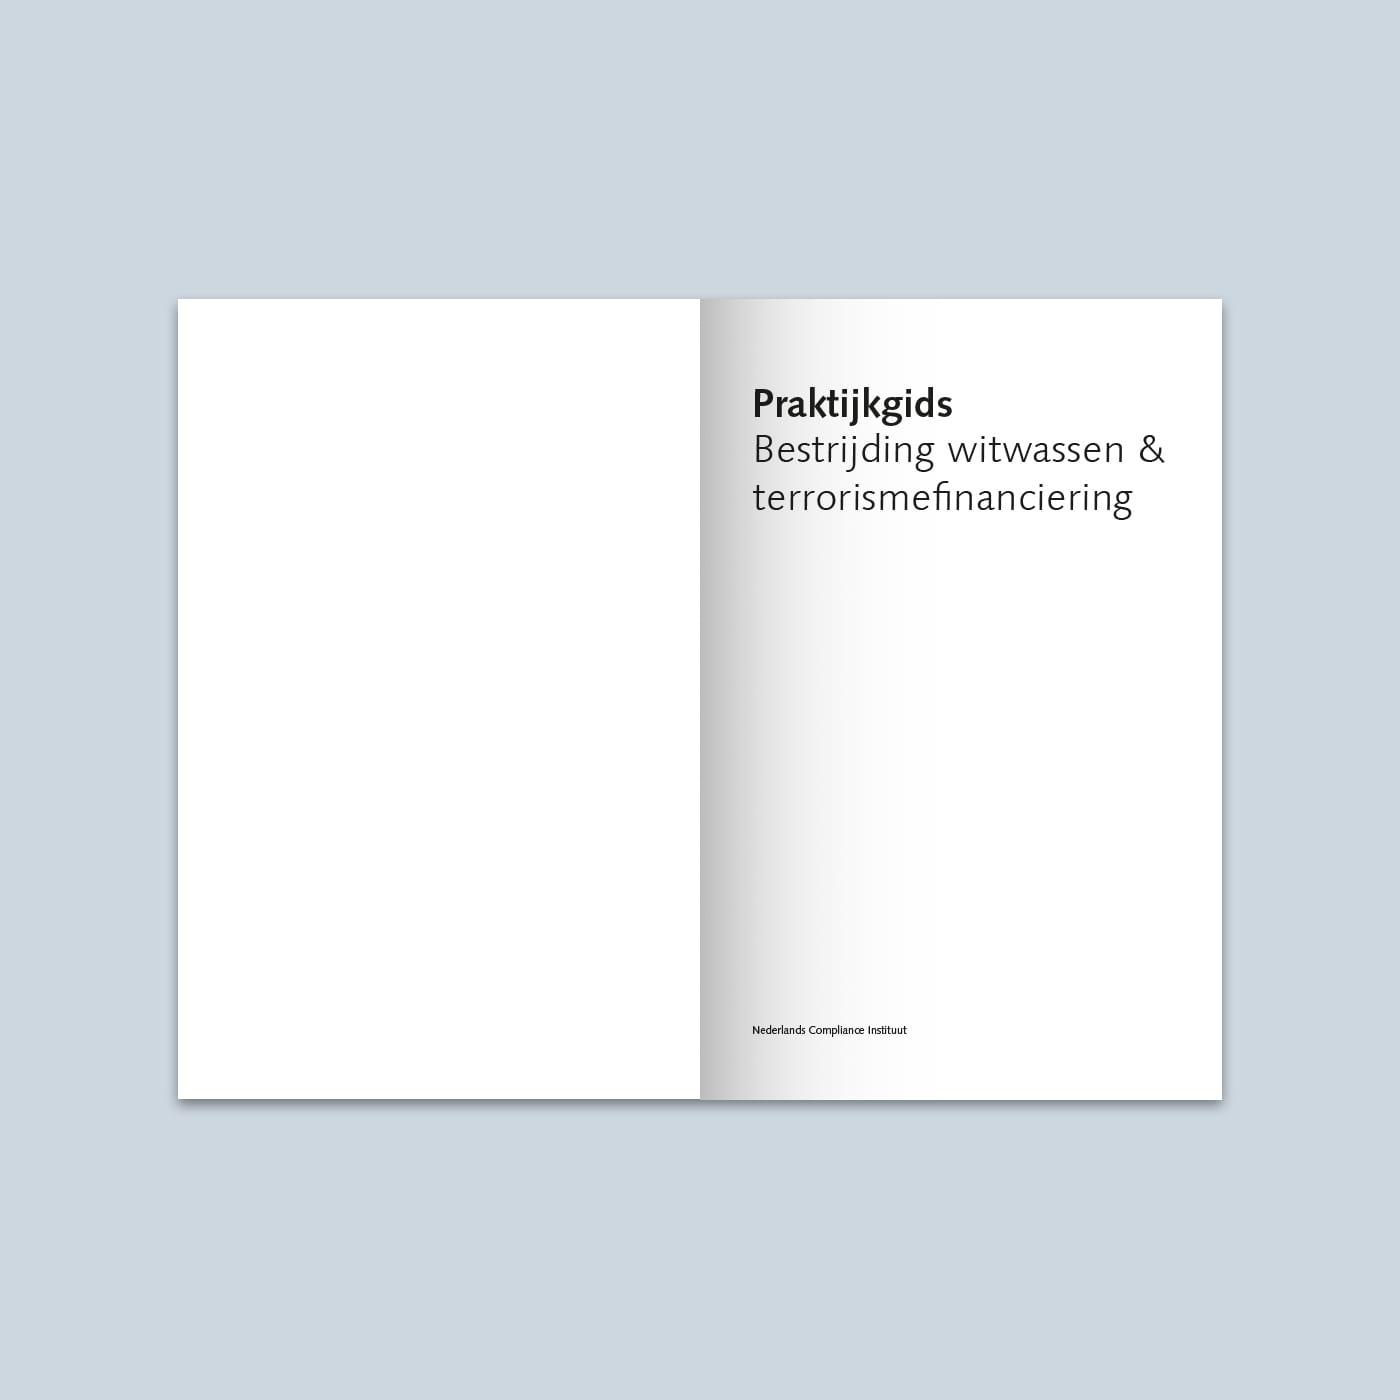 Praktijkgids Bestrijding witwassen binnenwerk 1